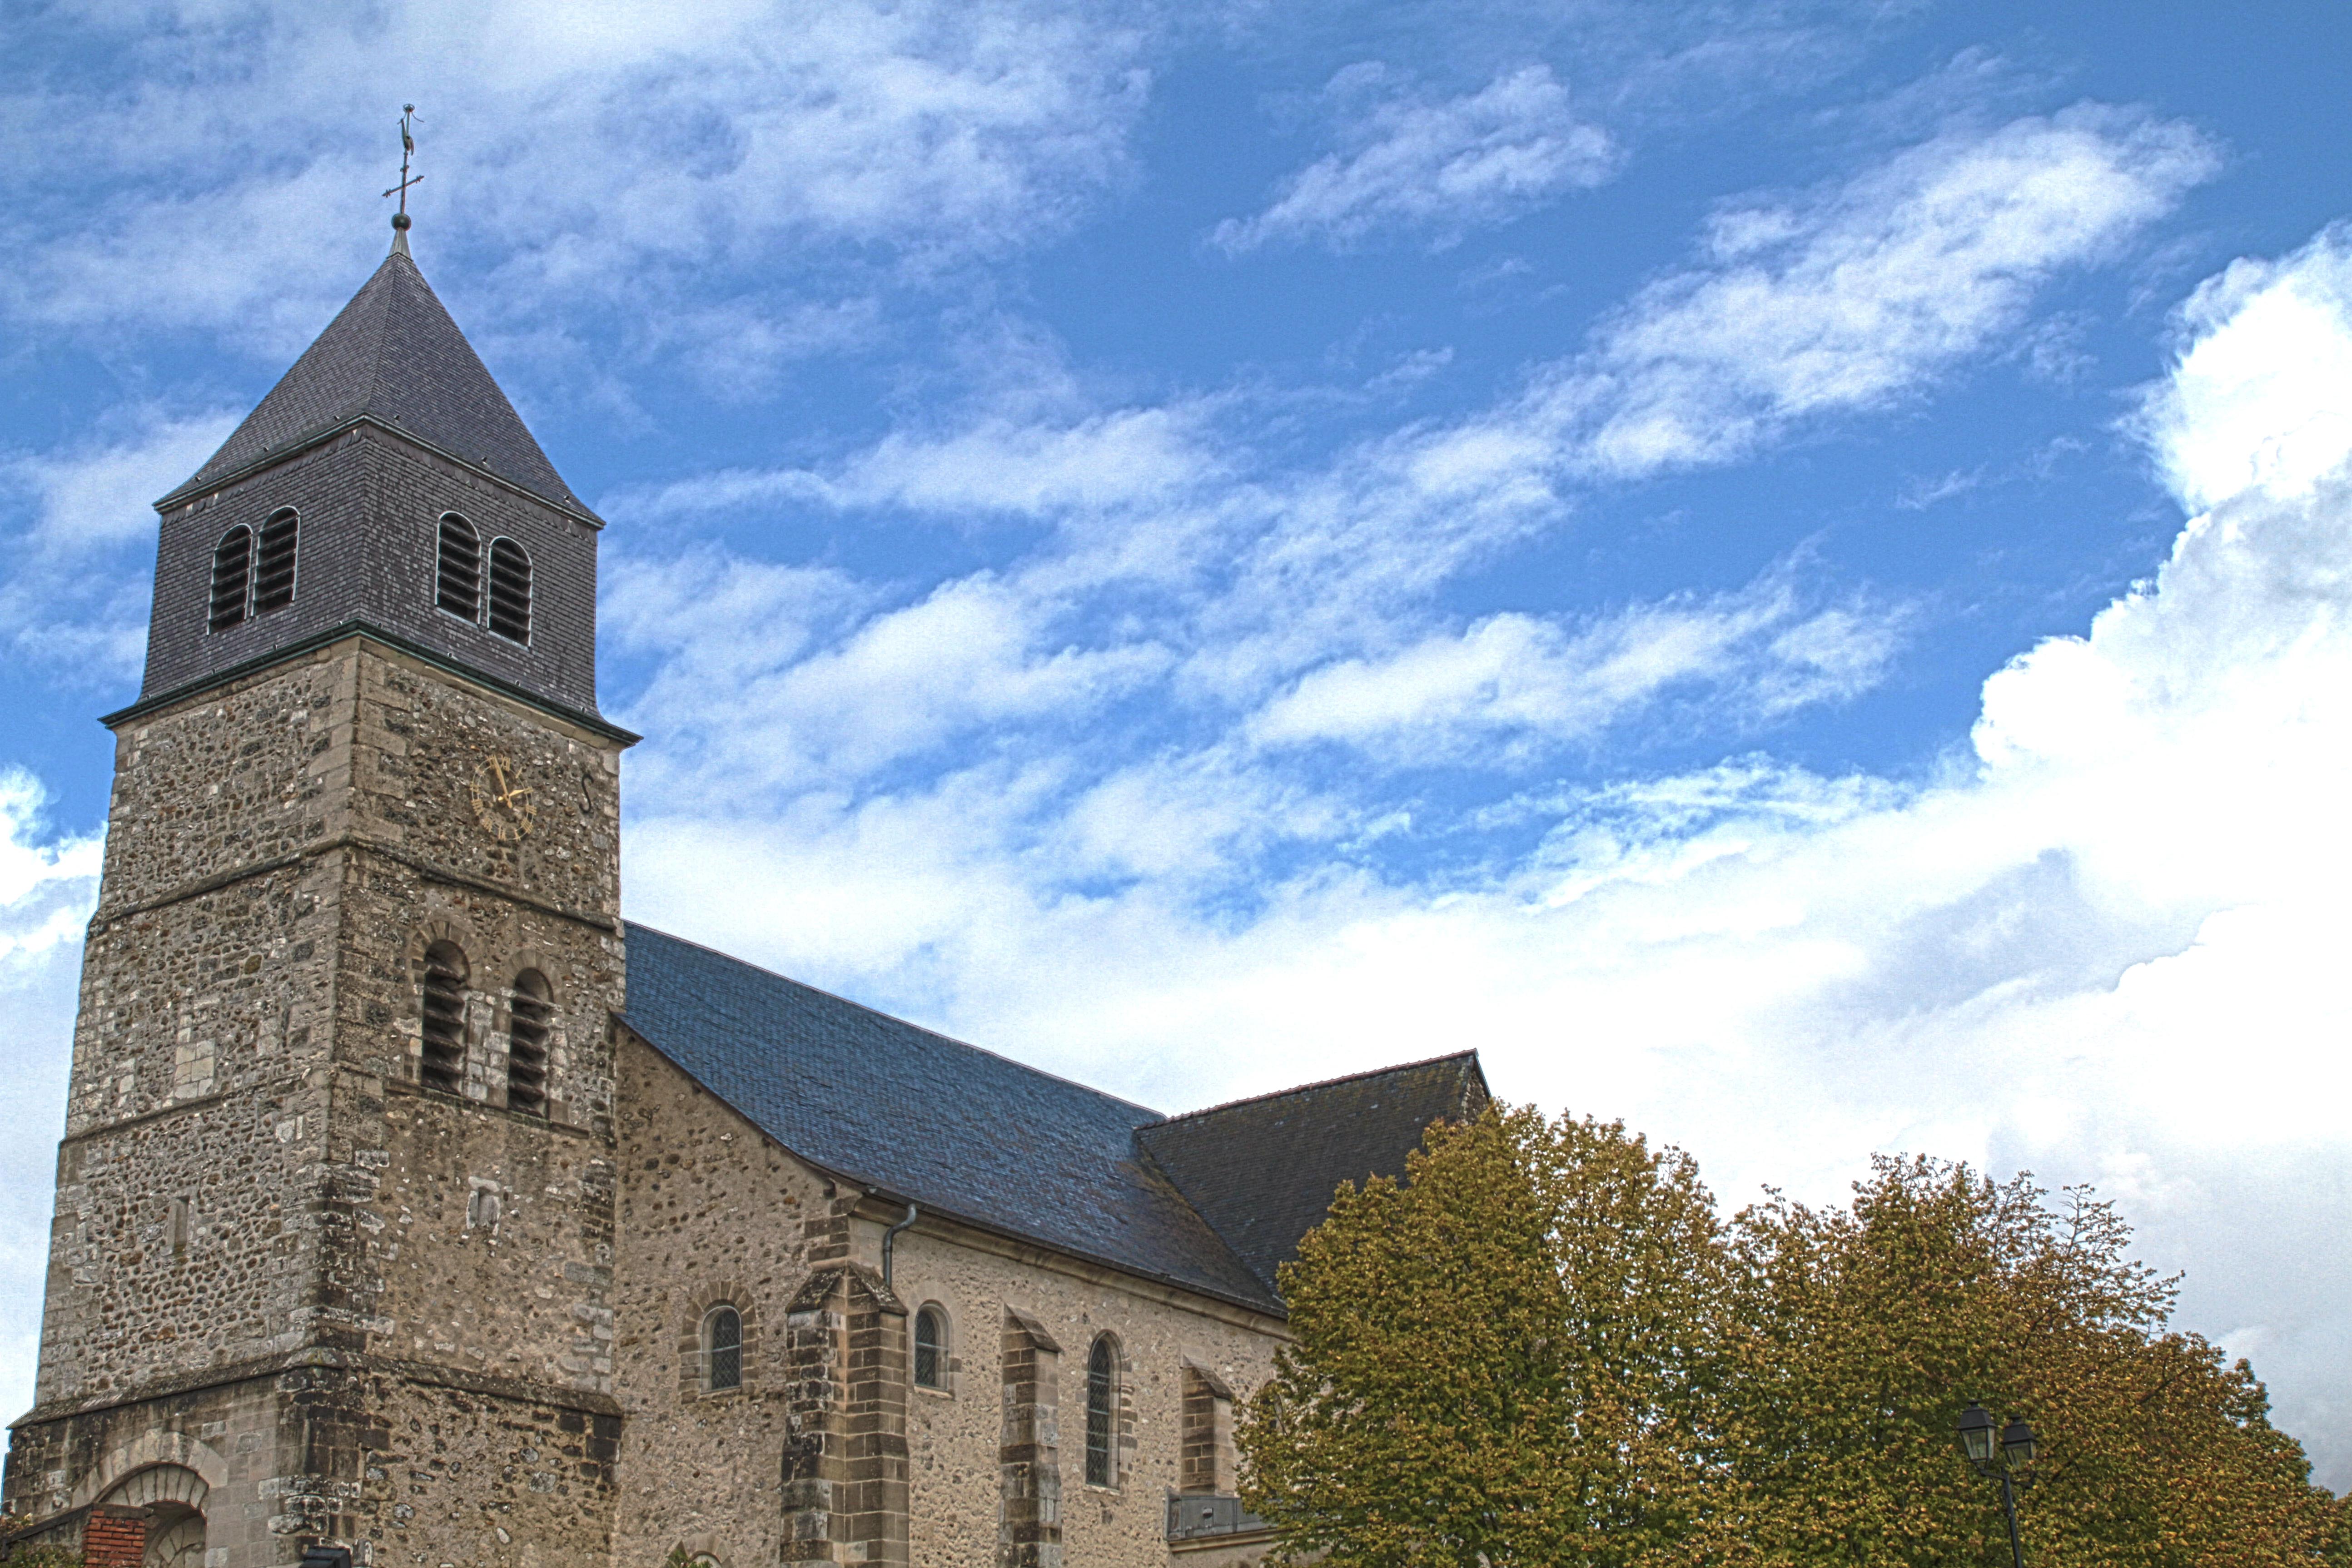 Villers-Allerand